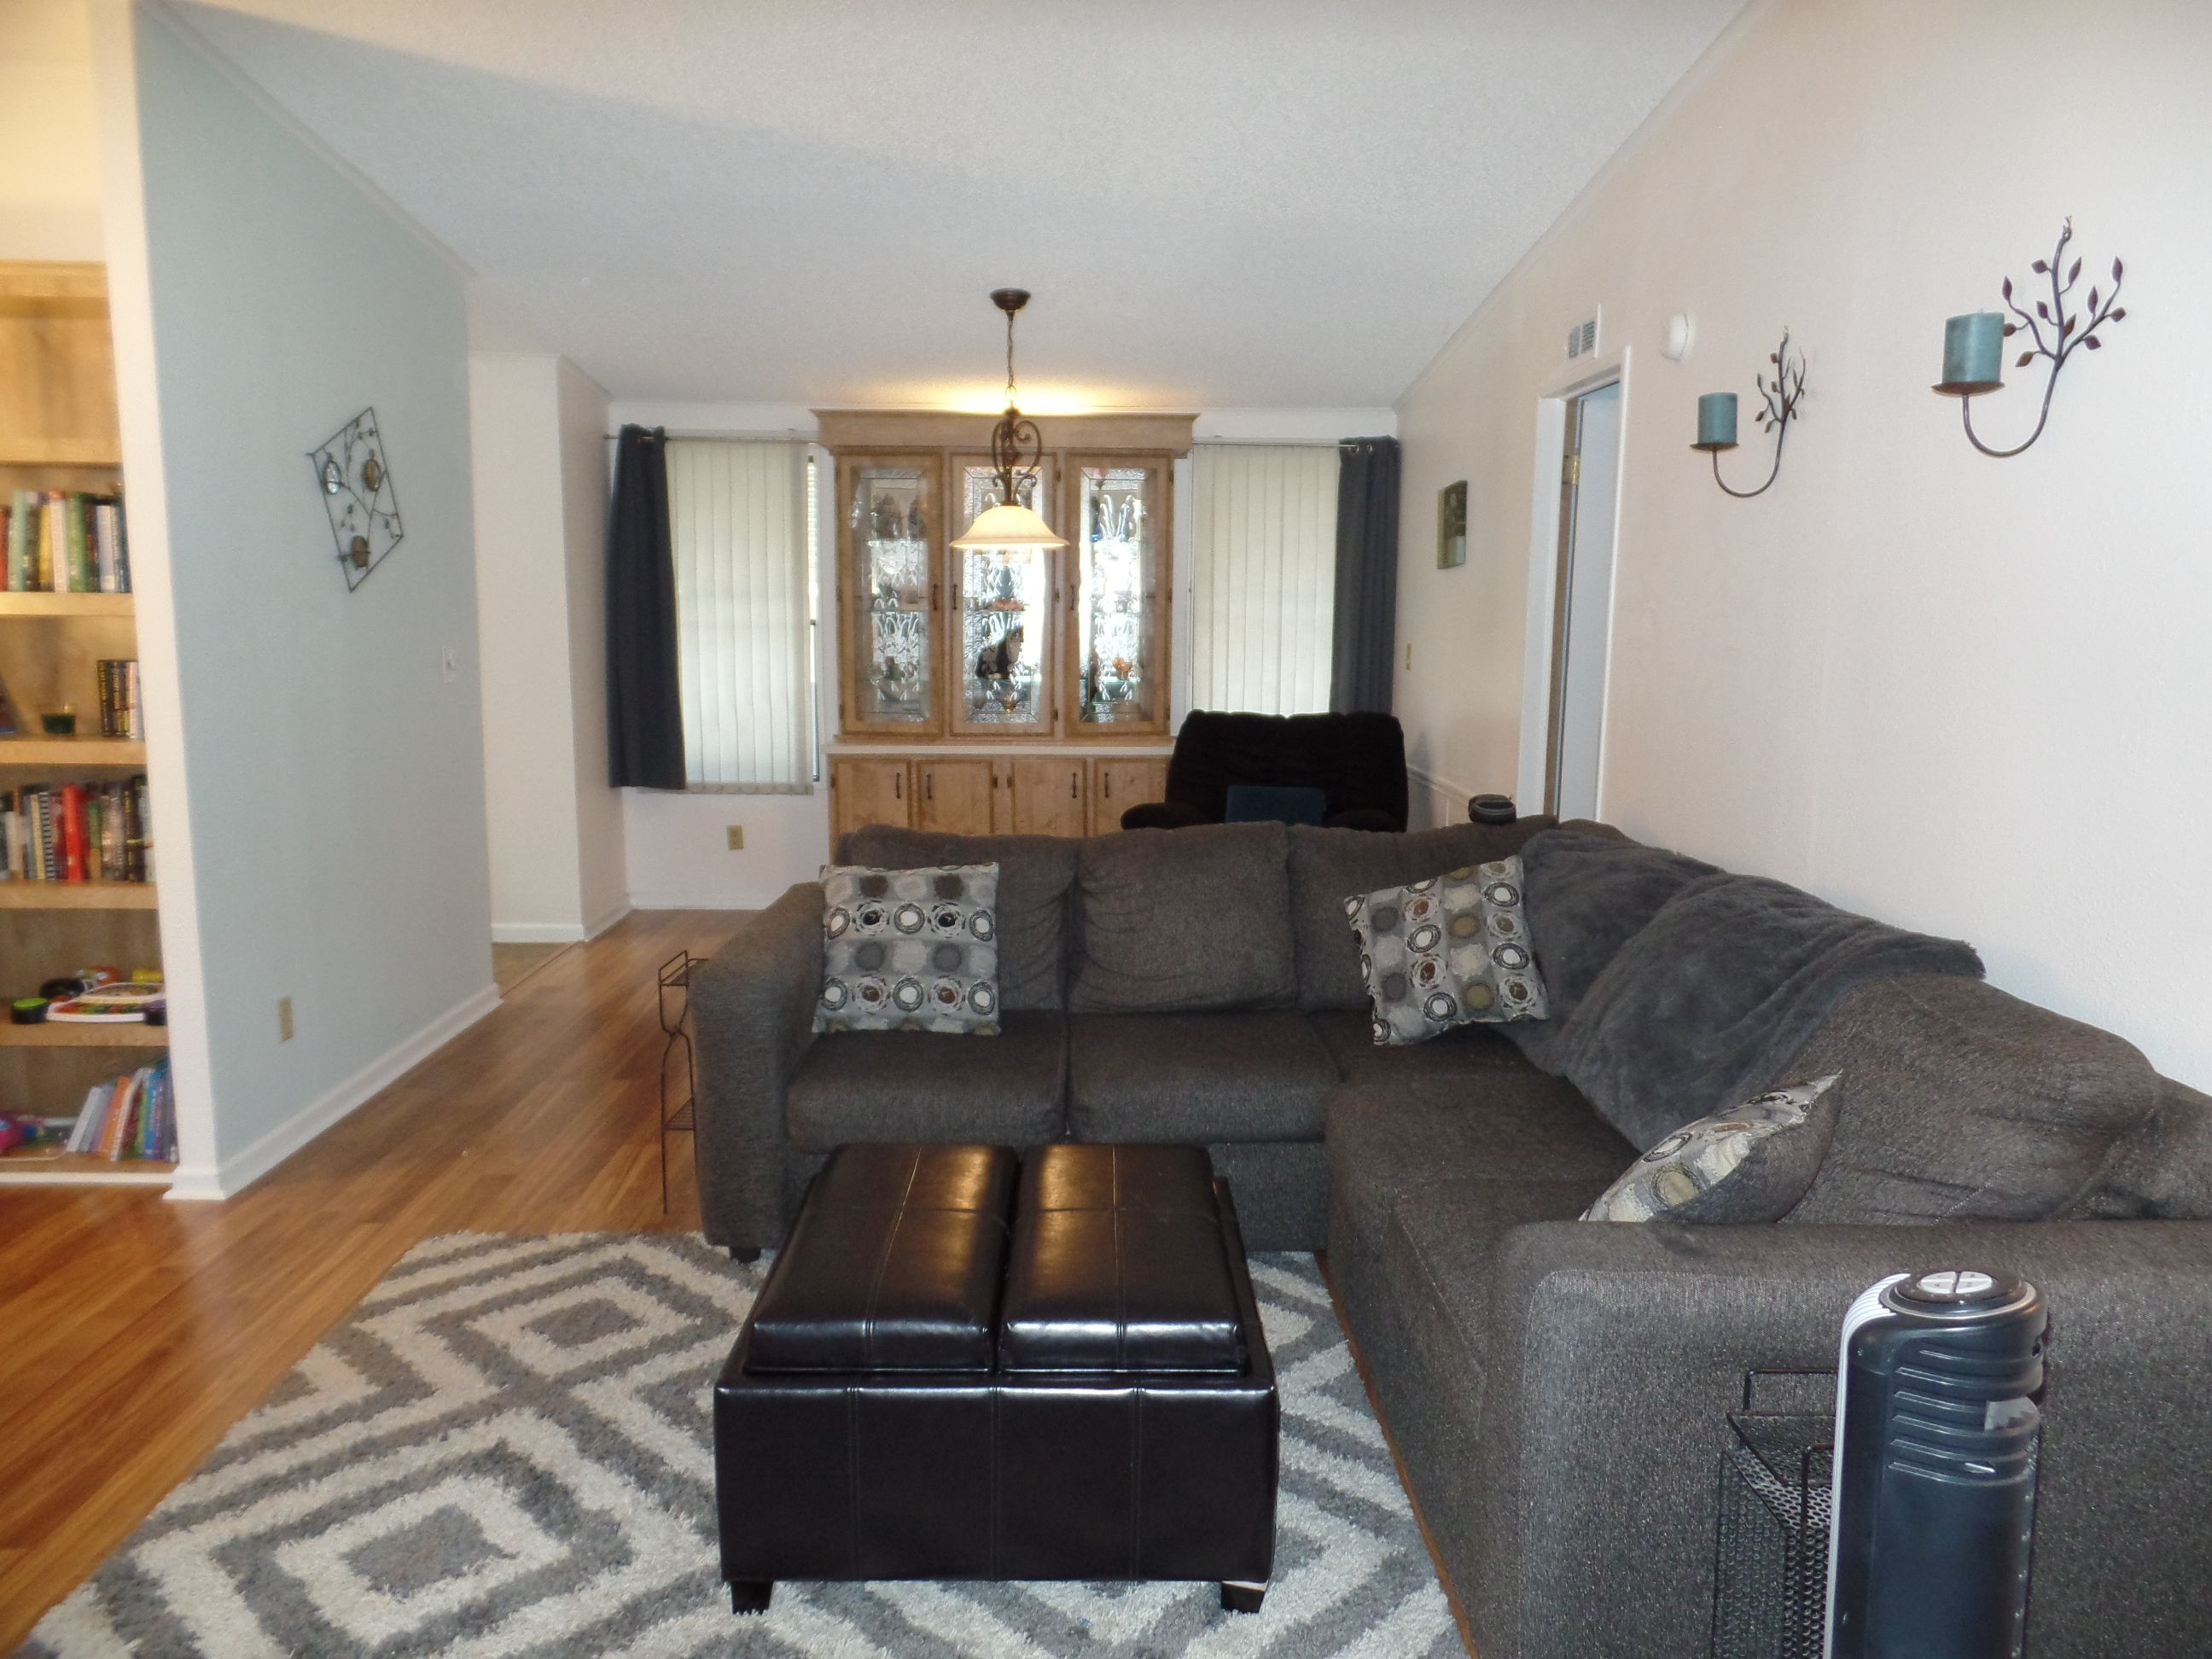 Livingroom 1987 Cavco Mobile / Manufactured Home in Phoenix, AZ via on home design trends 2016, home interior design 2015, home film 2016, home furniture 2016, home decorating 2016,